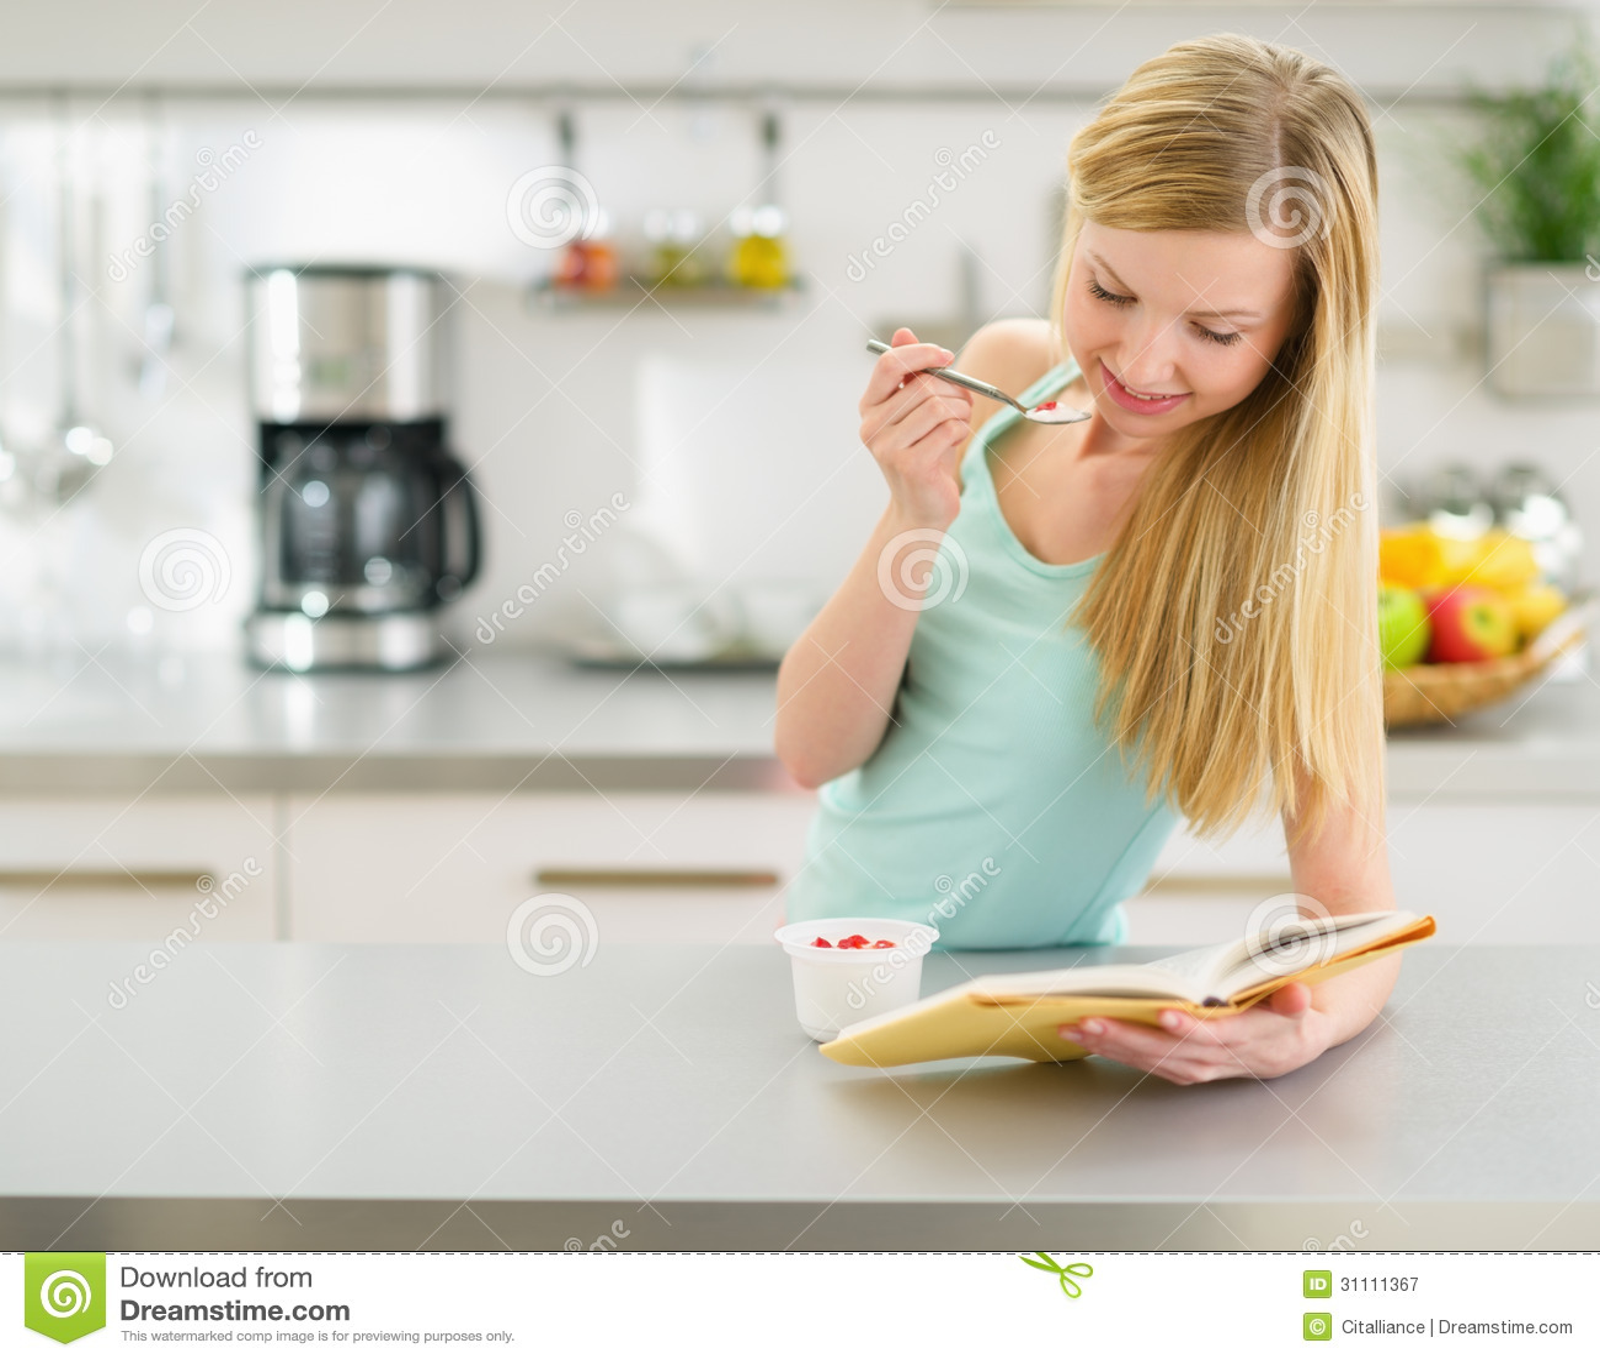 Happy Girl Kitchen: Happy Teenager Girl Reading Book And Eating Yogurt Royalty